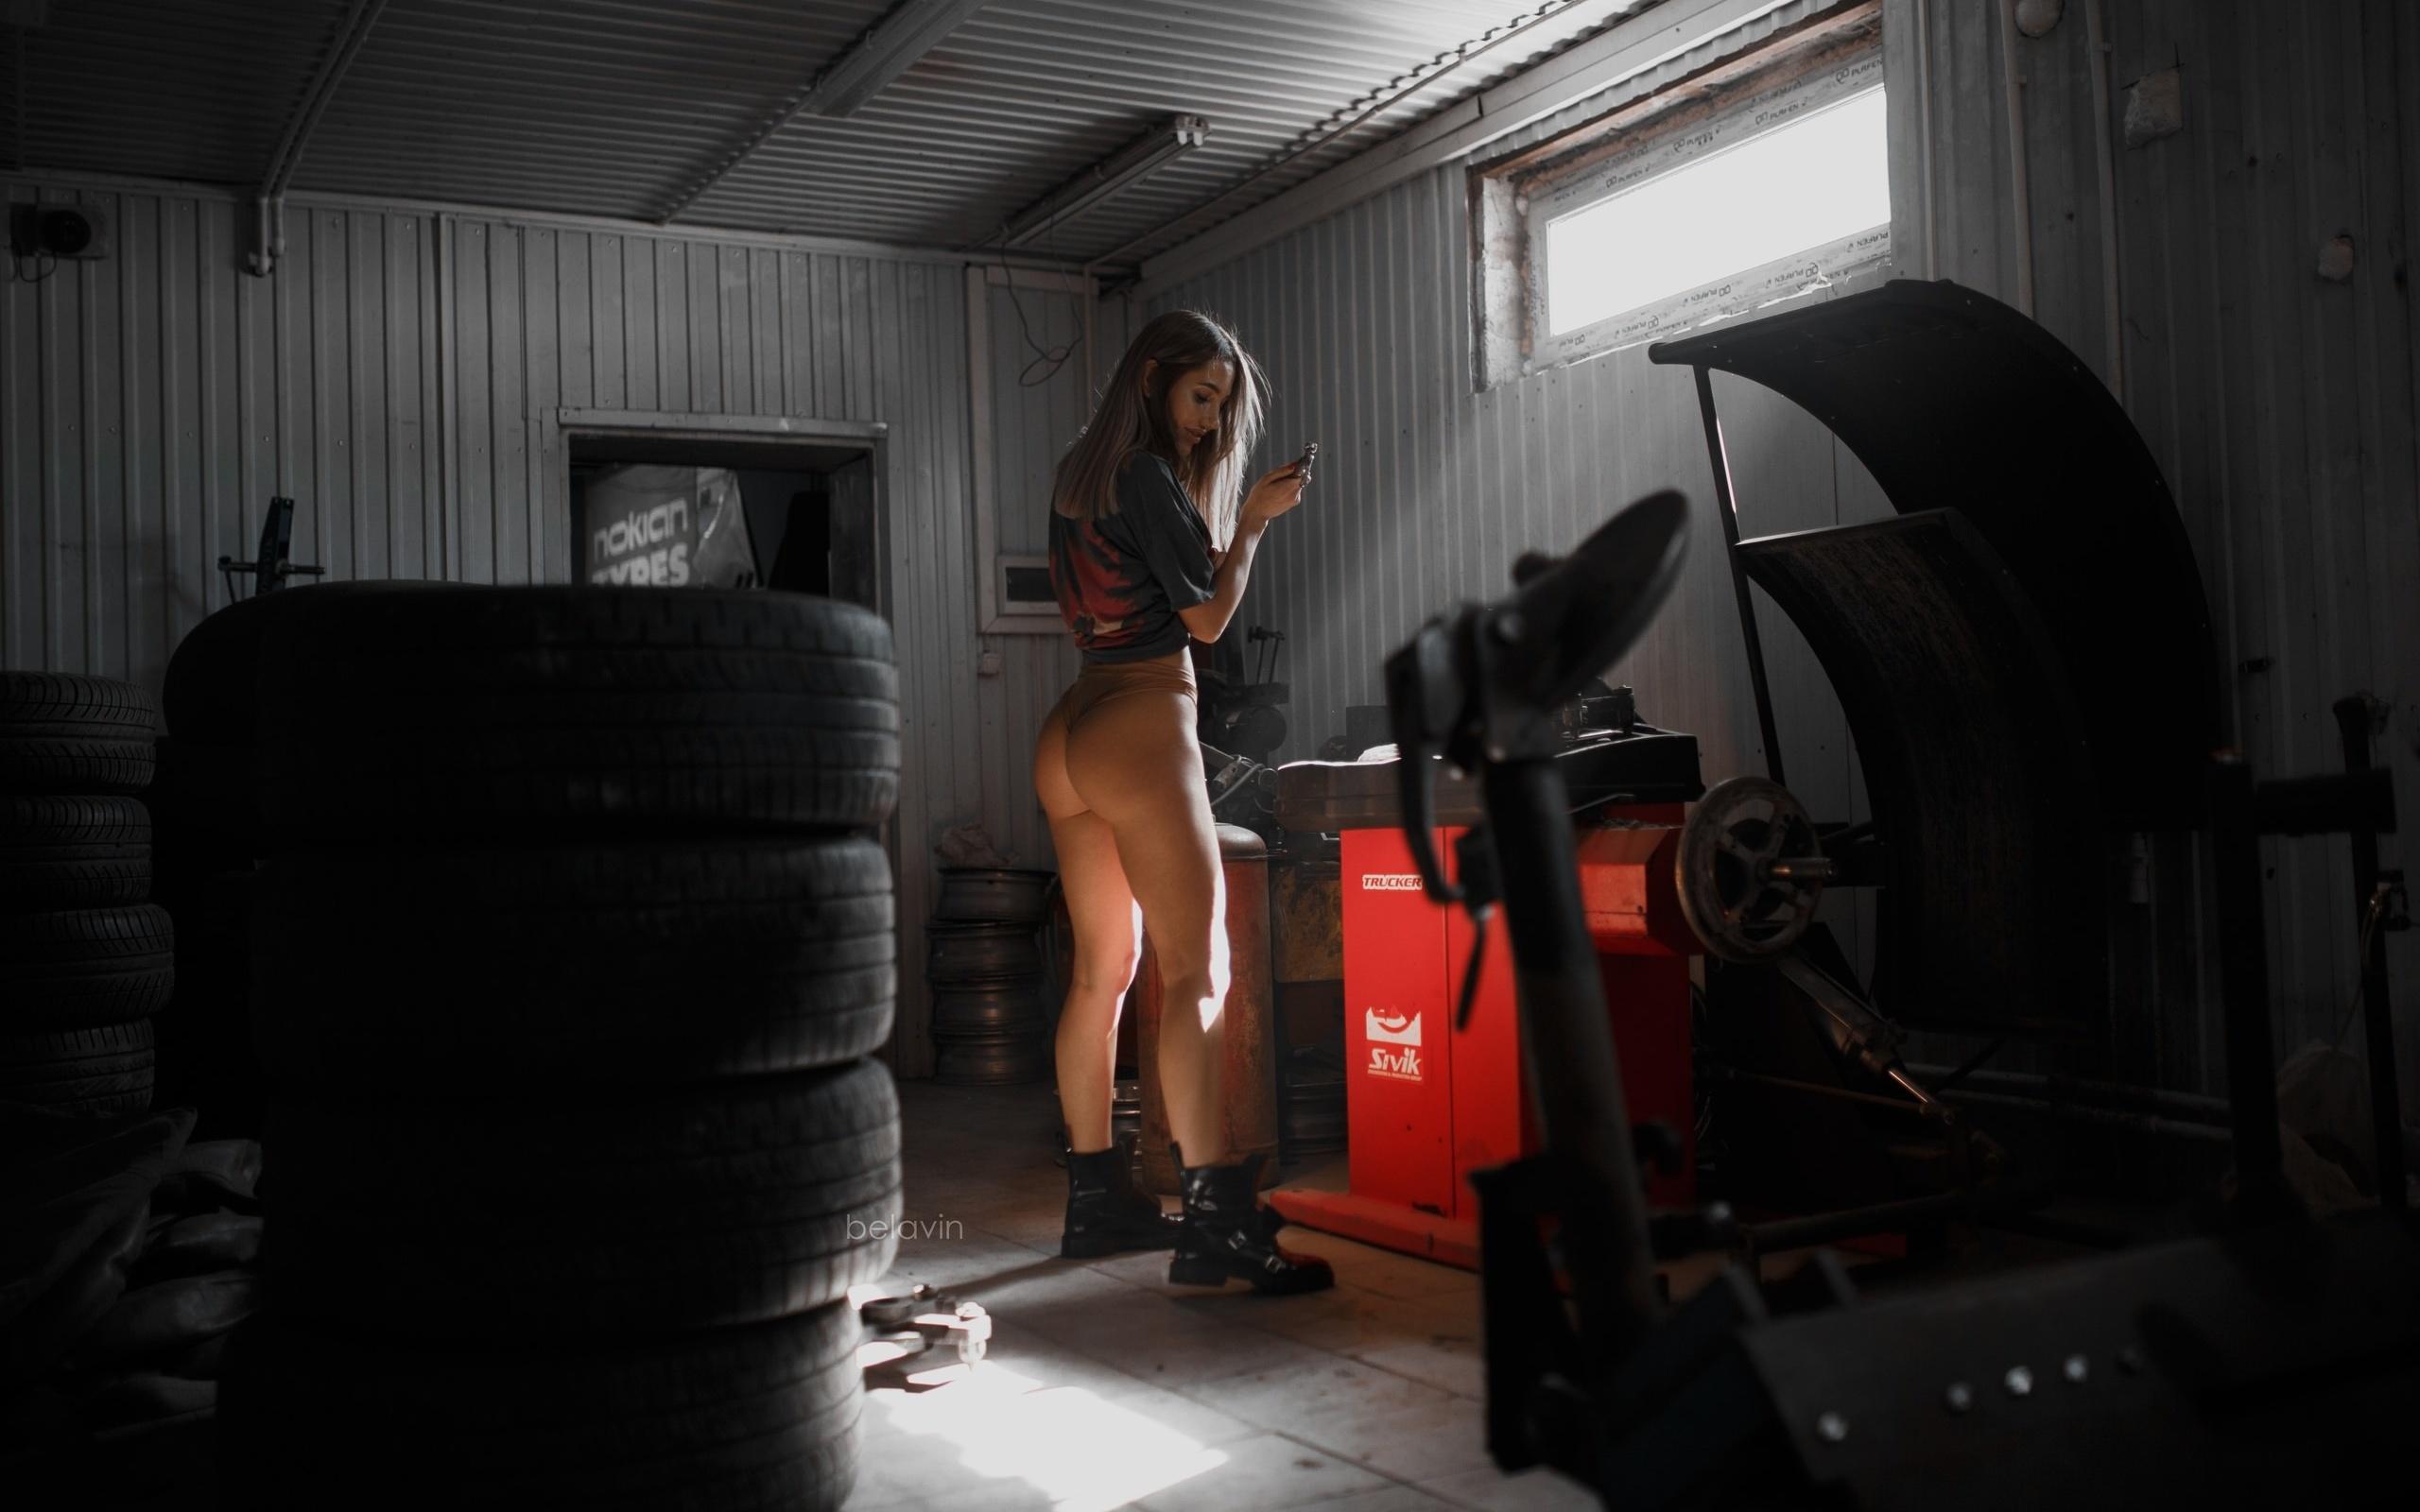 women, alexander belavin, tires, ass, shoes, women indoors, workshop, brunette, t-shirt, panties